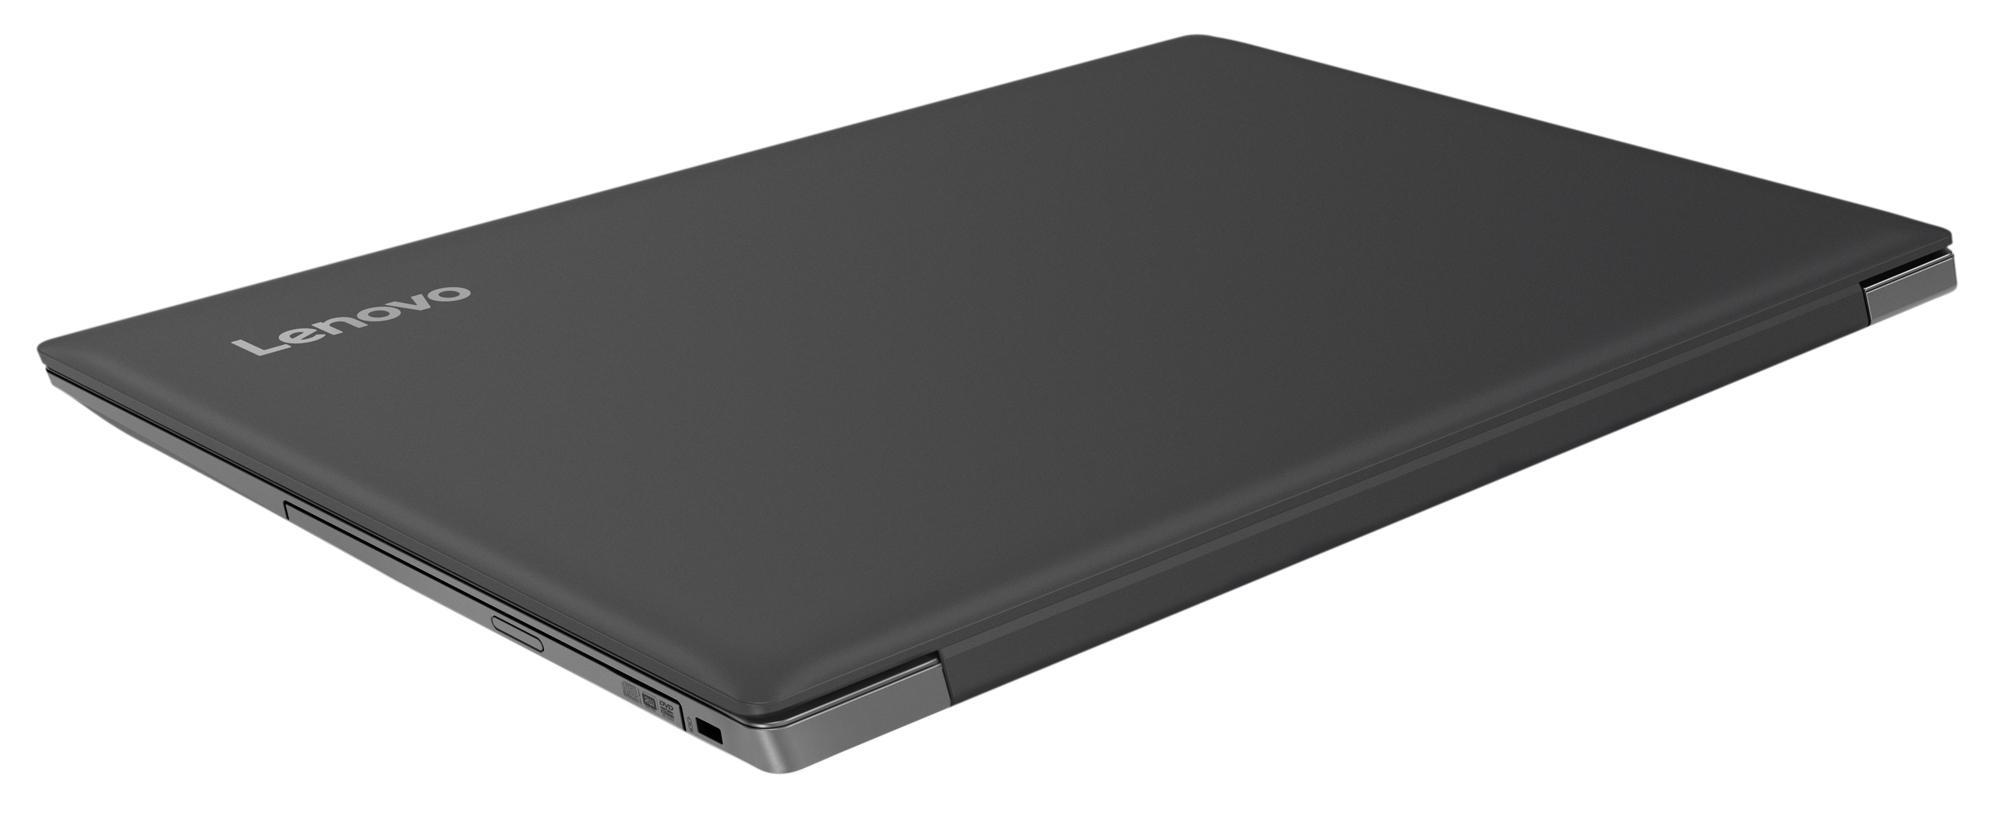 Фото  Ноутбук Lenovo ideapad 330-15 Onyx Black (81DC00JKRA)